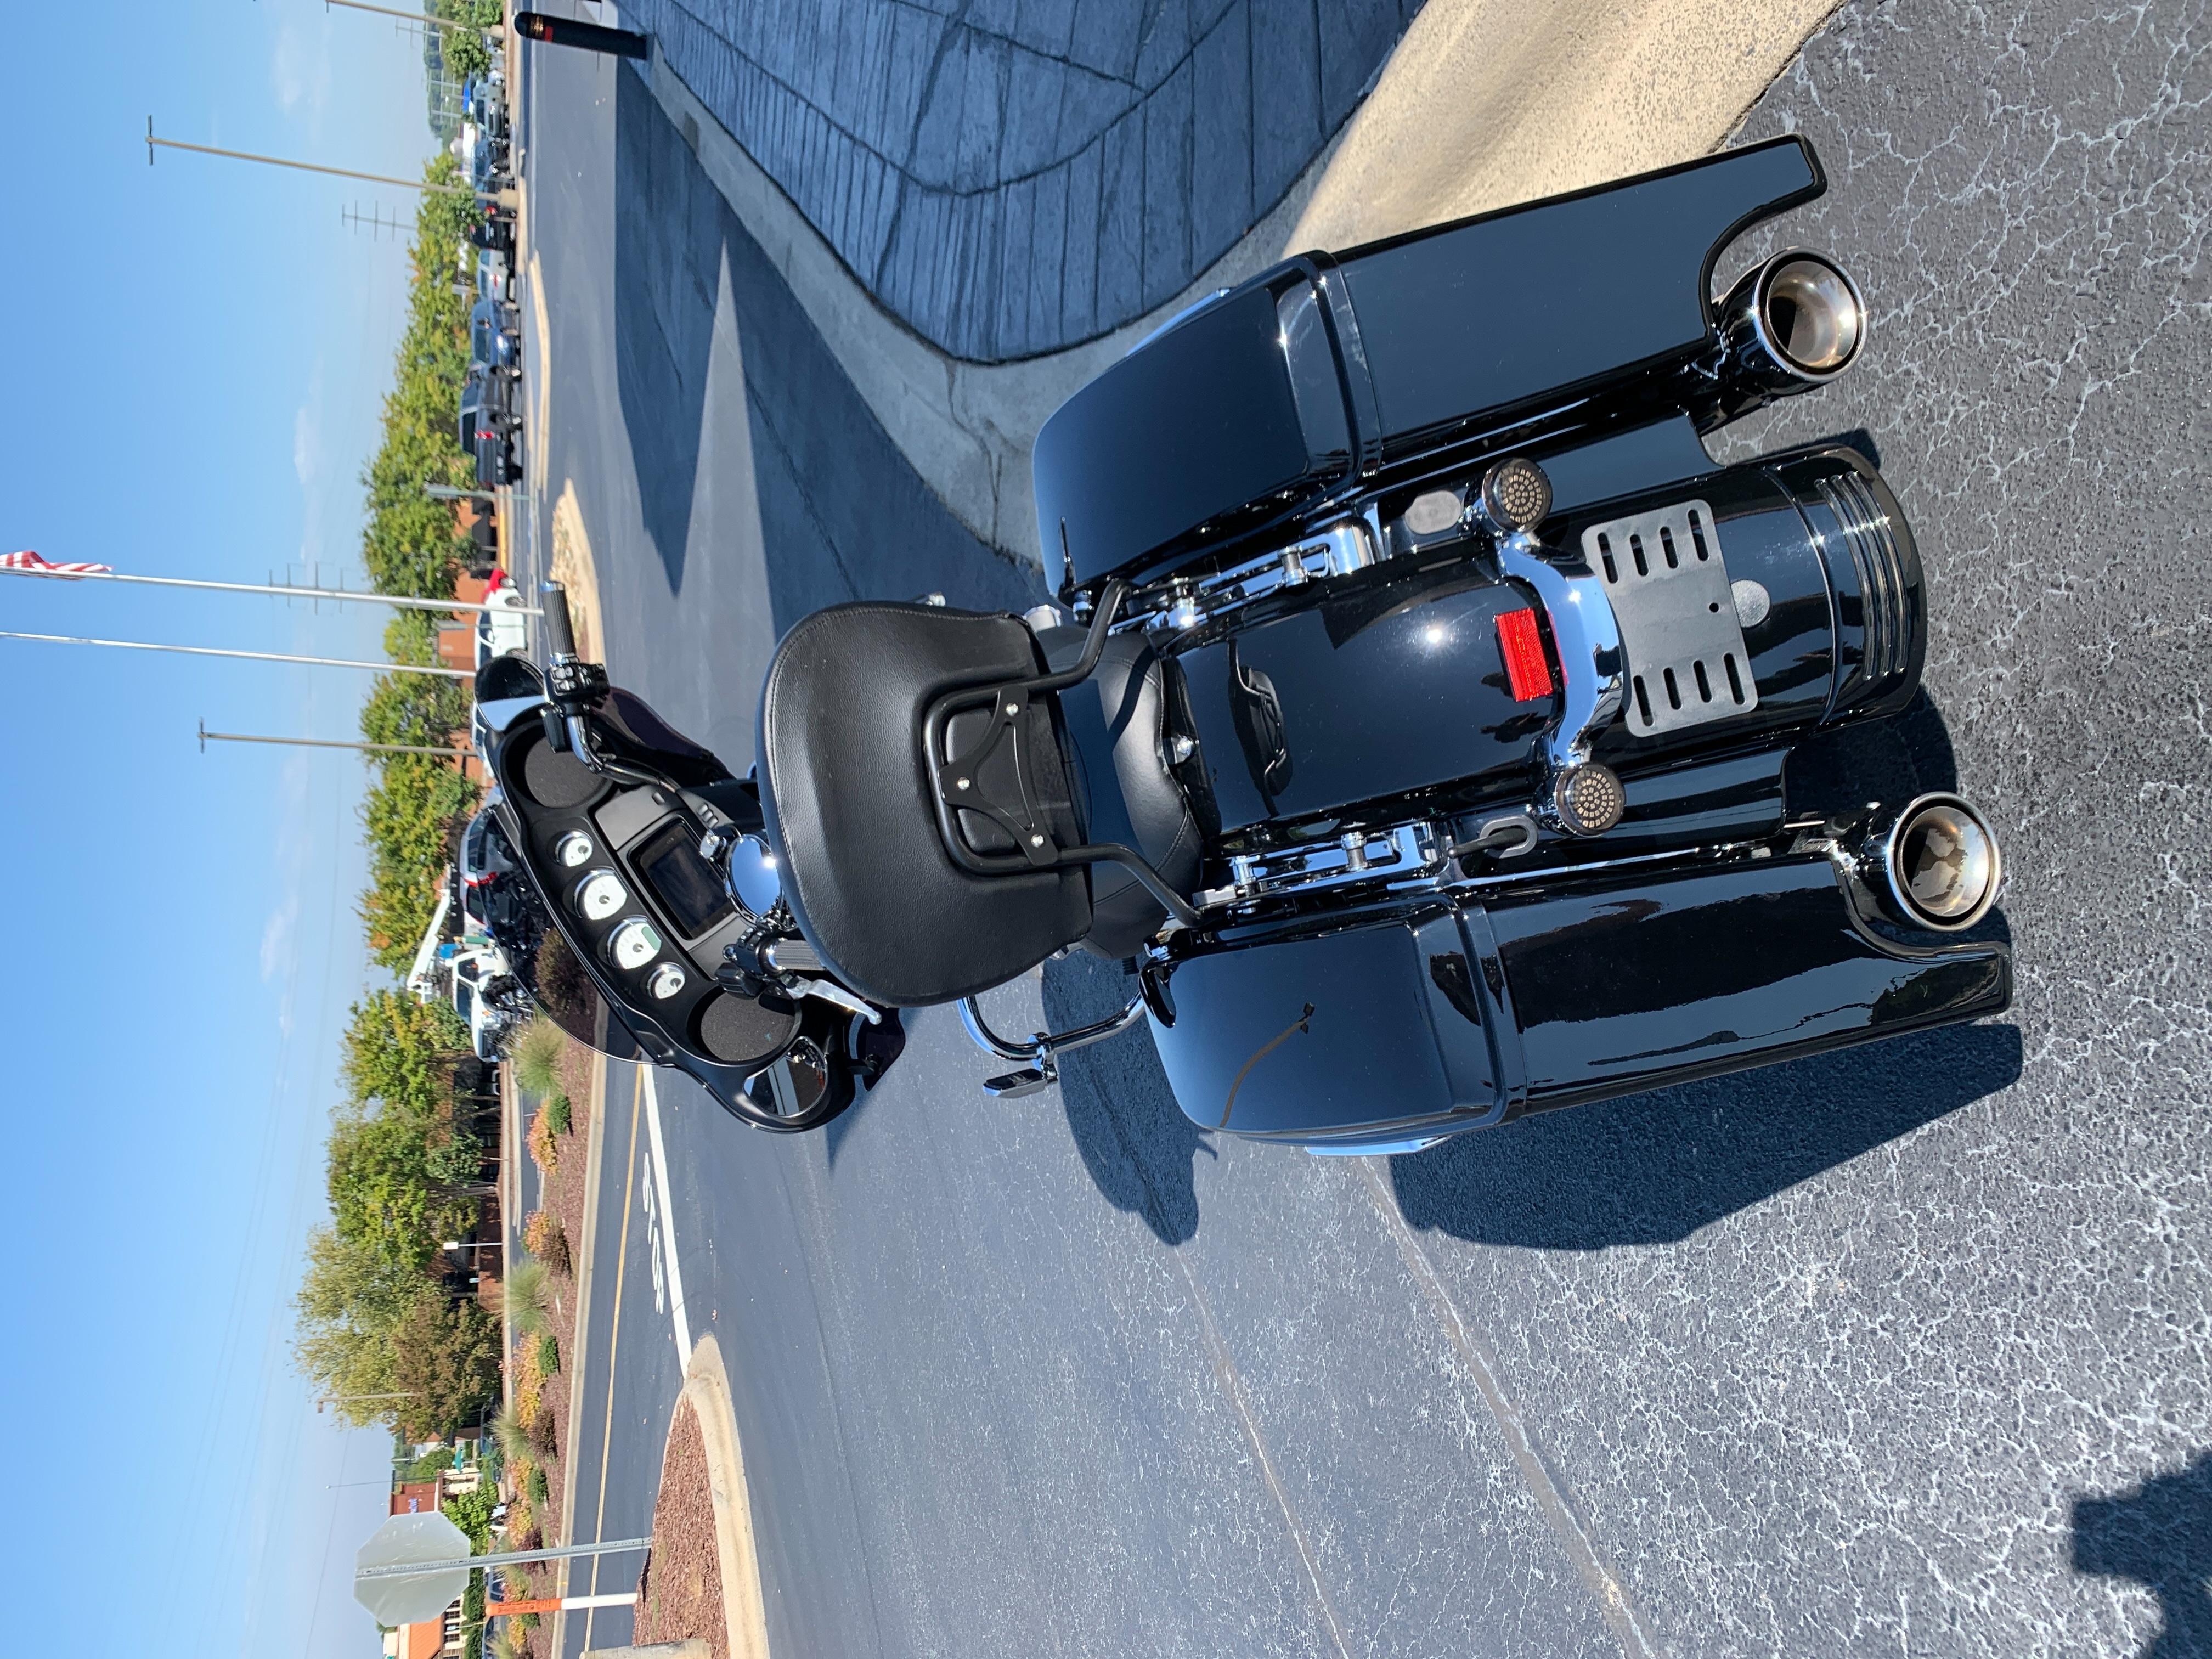 2019 Harley-Davidson Street Glide Base at Speedway Harley-Davidson